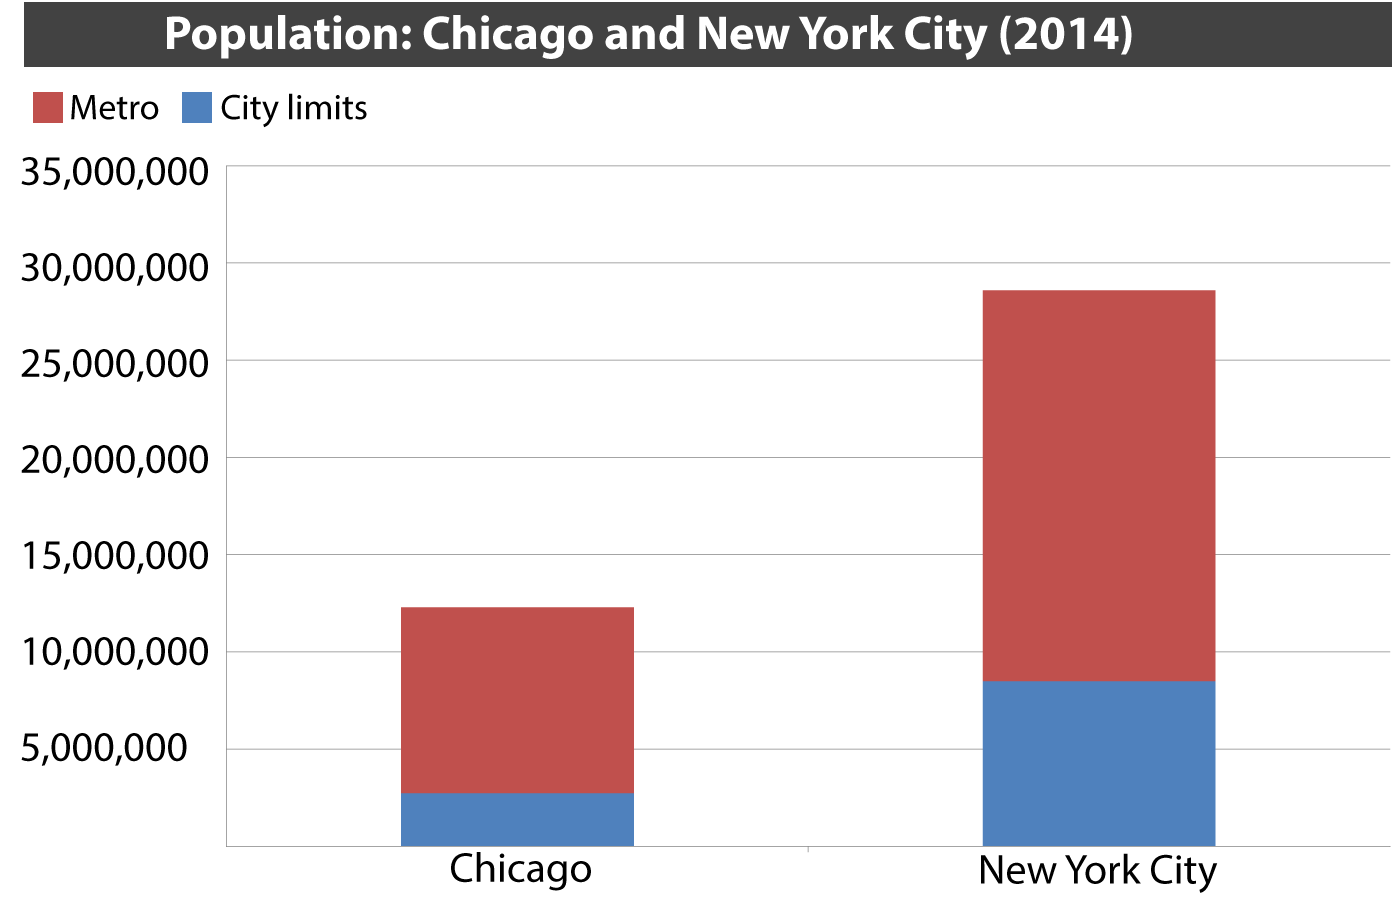 Source: American Community Survey 2014 estimates